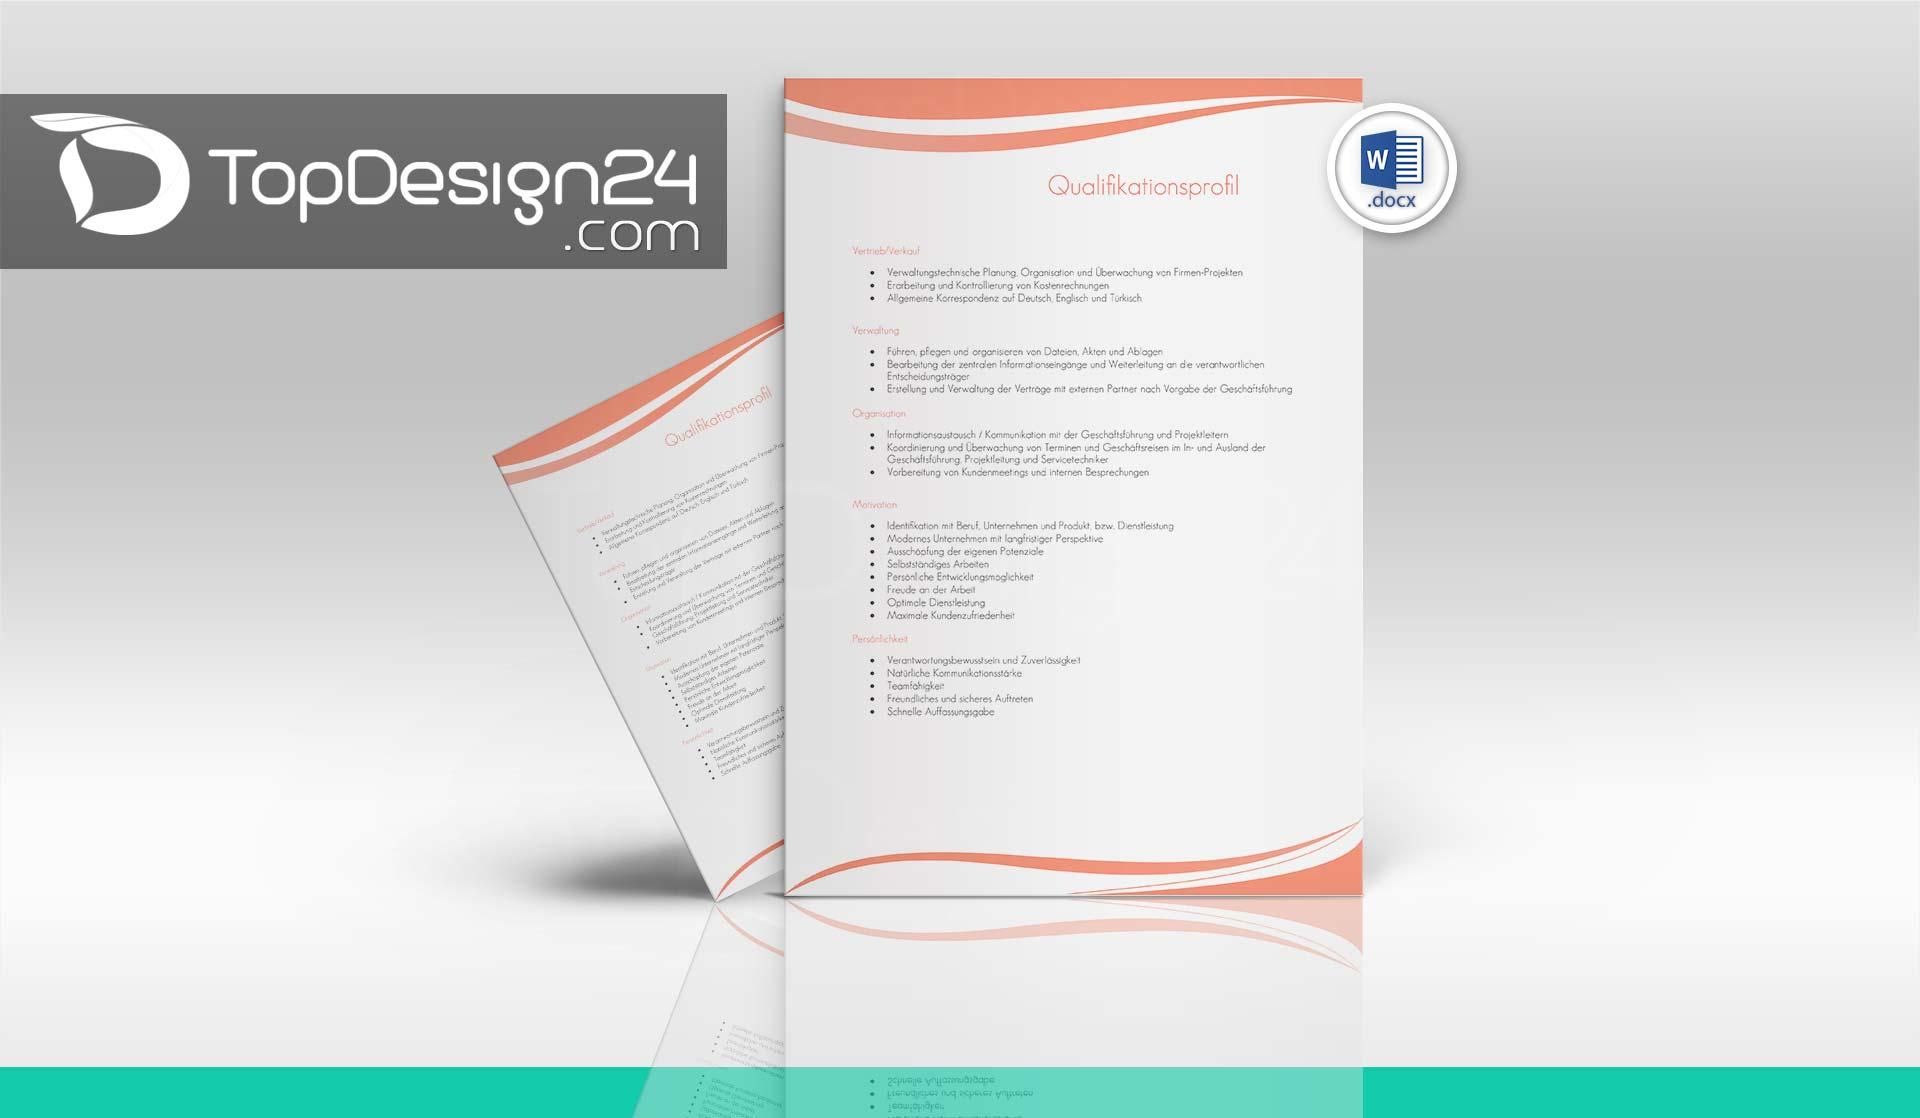 Bewerbung Muster Download - TopDesign24 Deckblatt, Lebe